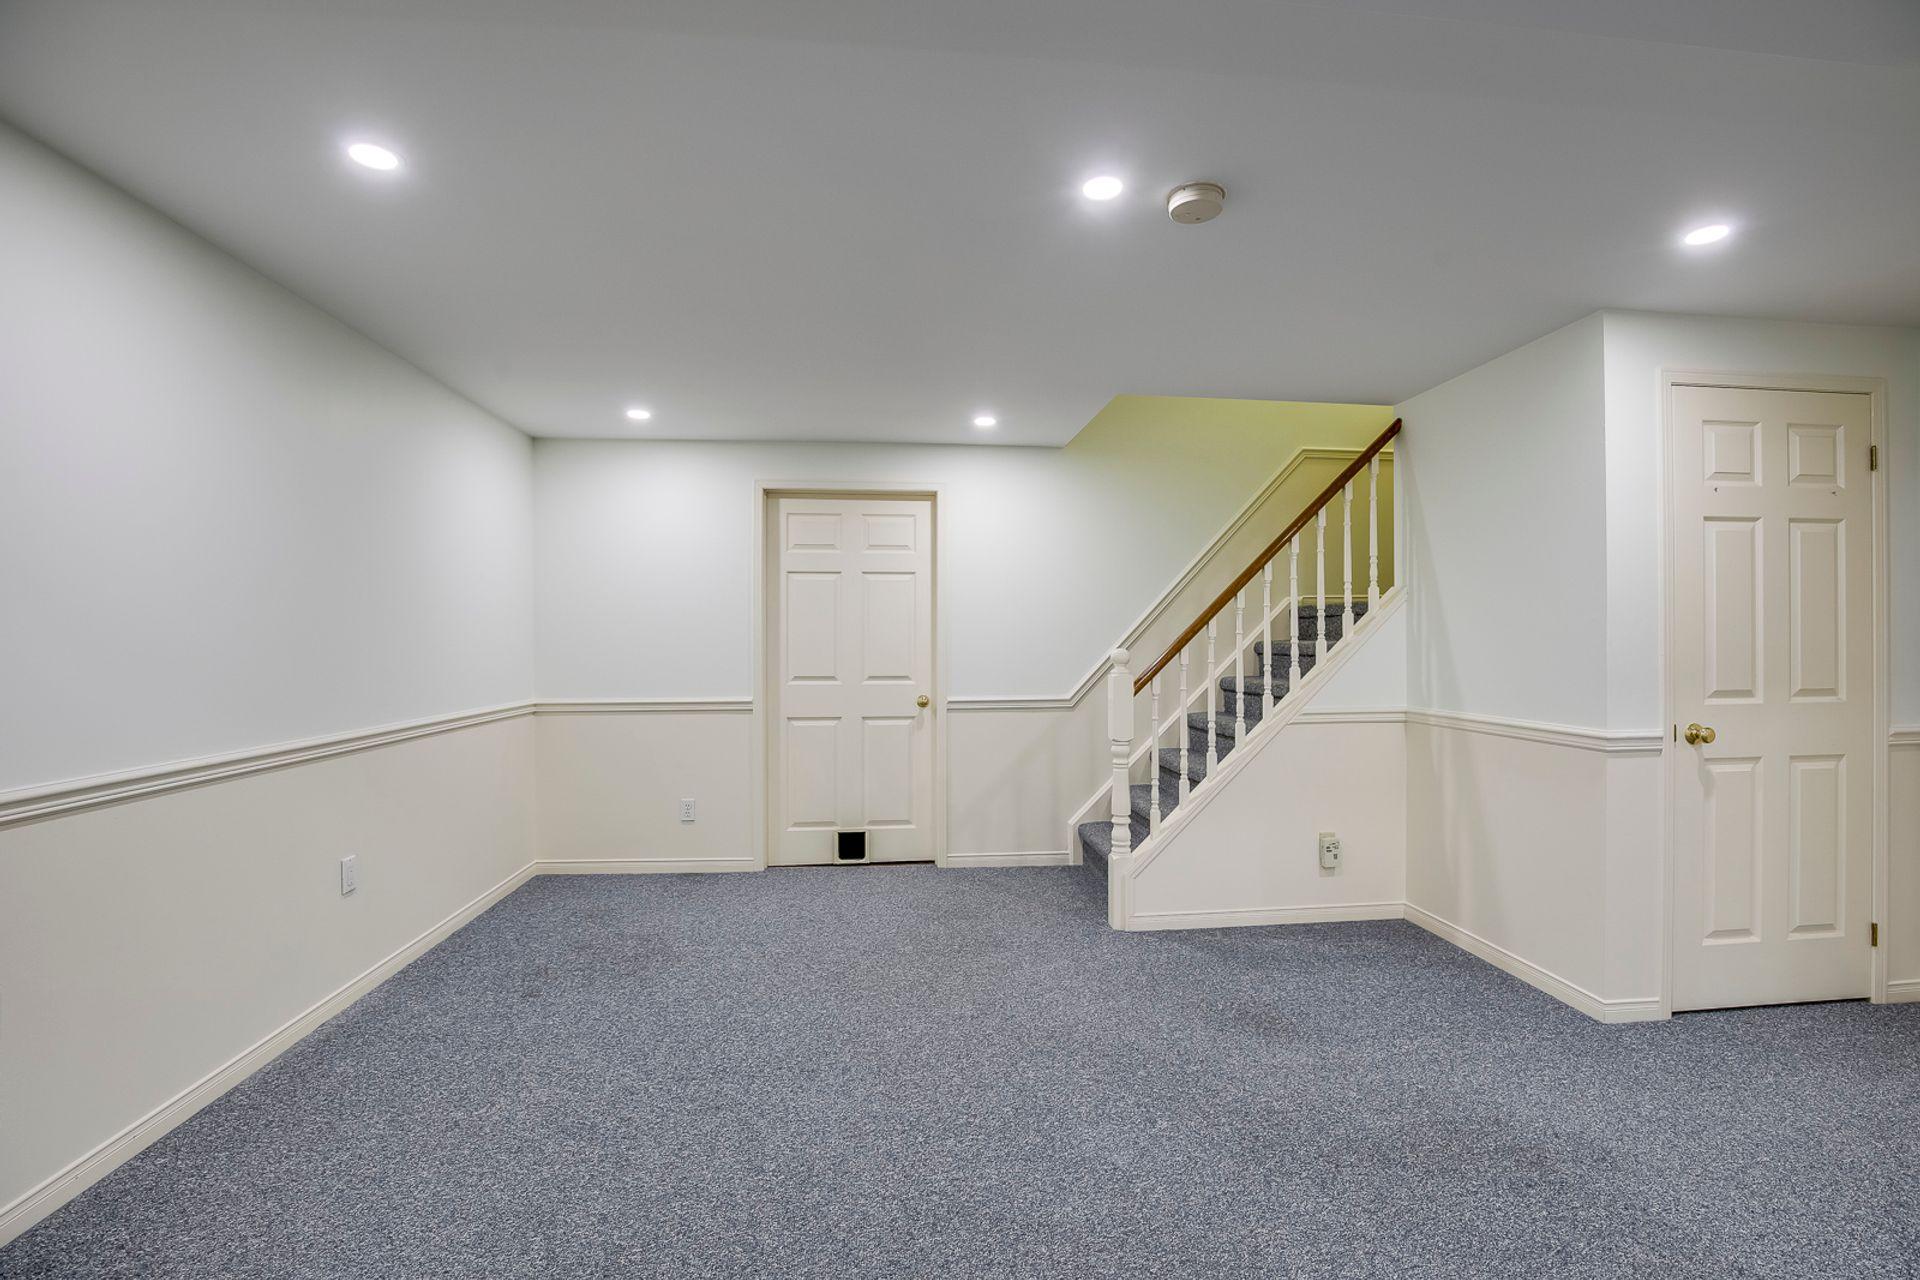 Basement - 2180 Dunvegan Ave, Oakville - Elite3 & Team at 2180 Dunvegan Avenue, Eastlake, Oakville